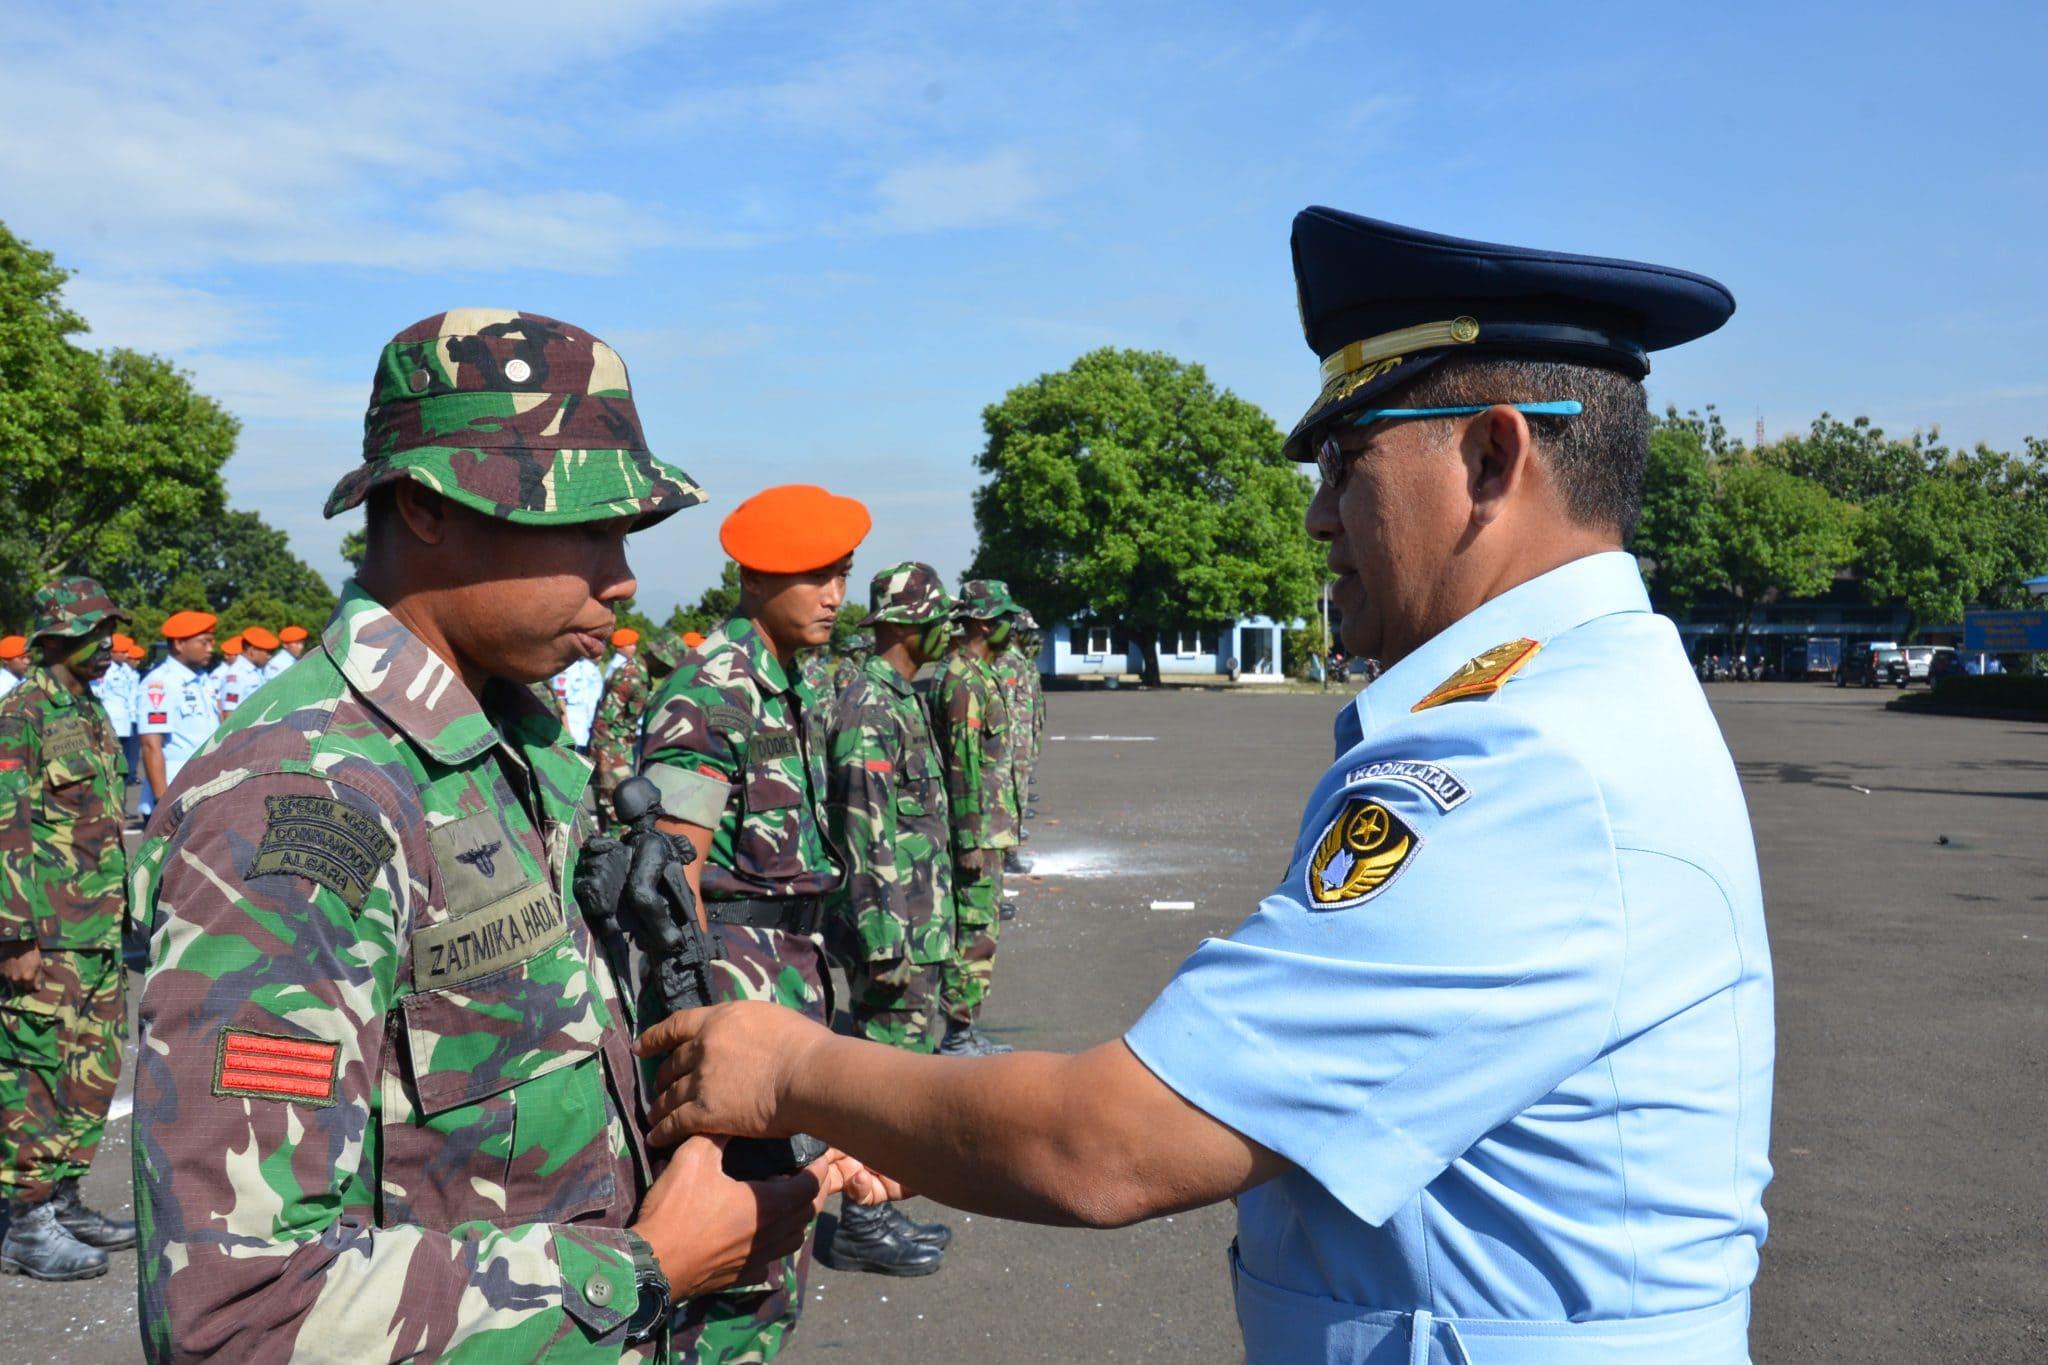 Praka Zatmika Hadi Suwasono Lulusan Terbaik Susjurlata Pas A-45 Lanud Sulaiman